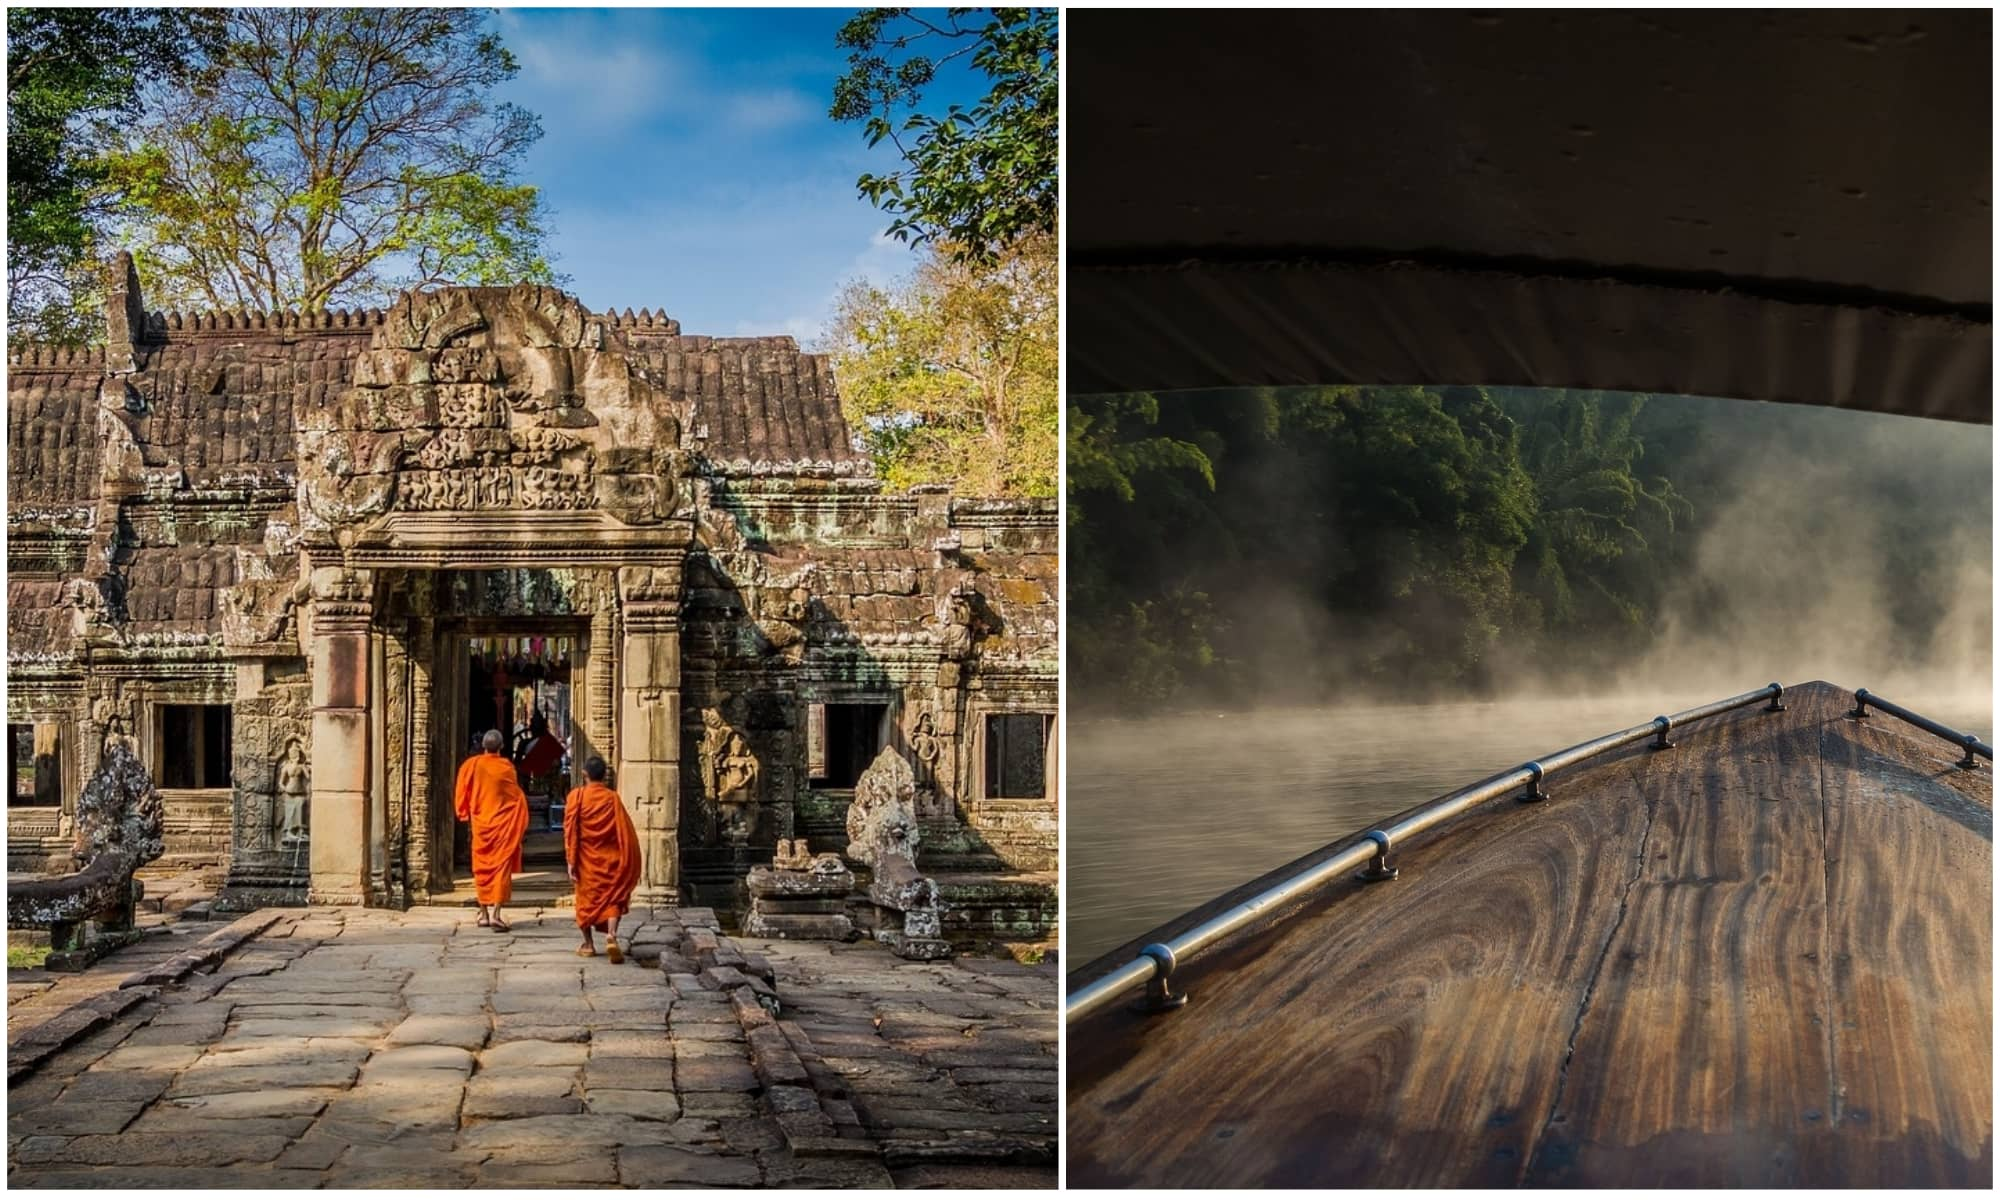 bangkok, bangkoka, taizeme, thailand, таиланд, бангкок